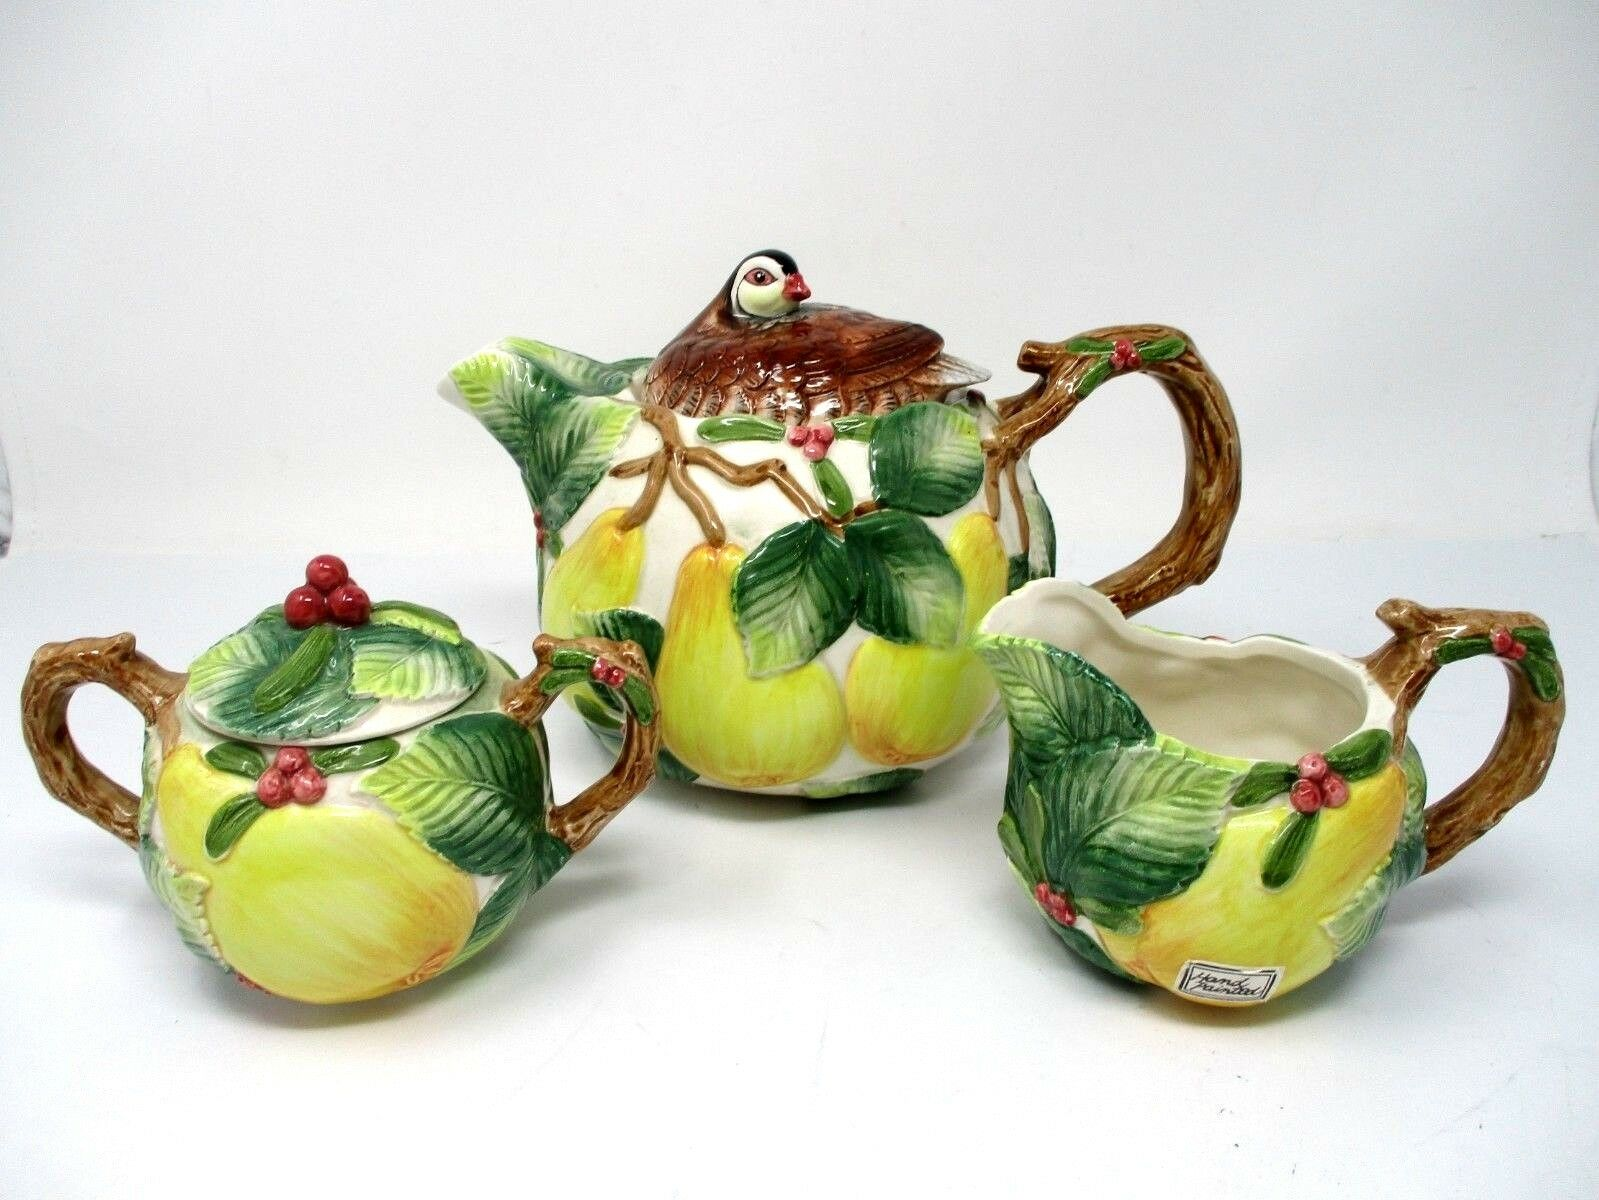 Fitz & Floyd Tea Pot, Creamer & Sugar Bowl 1991